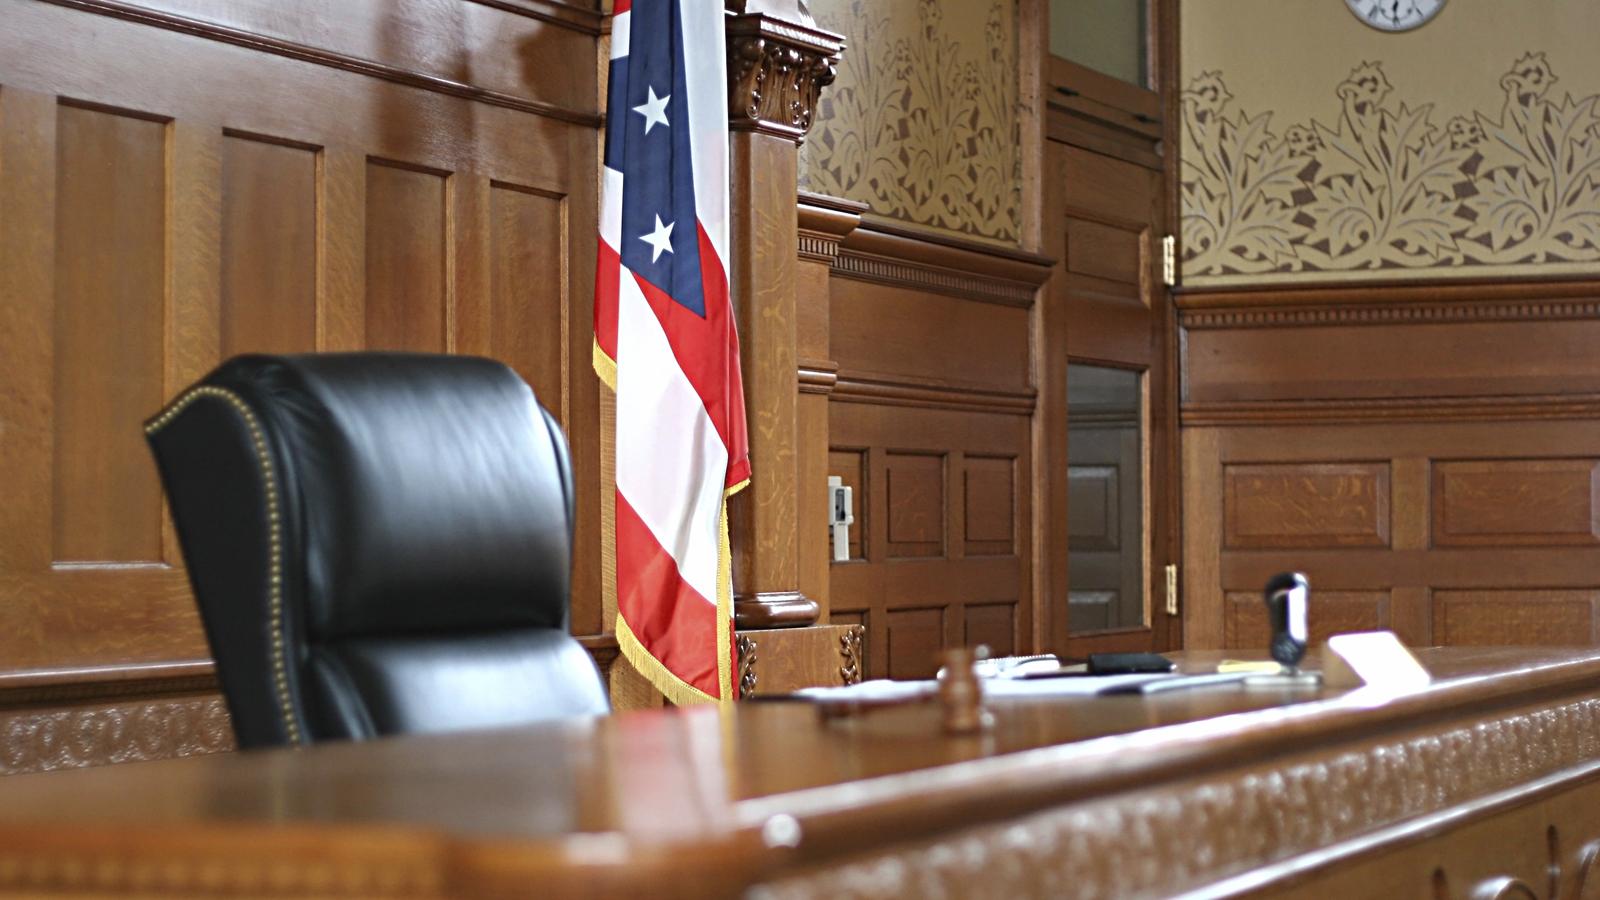 HRC Urges Senate to Reject Anti-LGBTQ Judicial Nominee Lawrence VanDyke